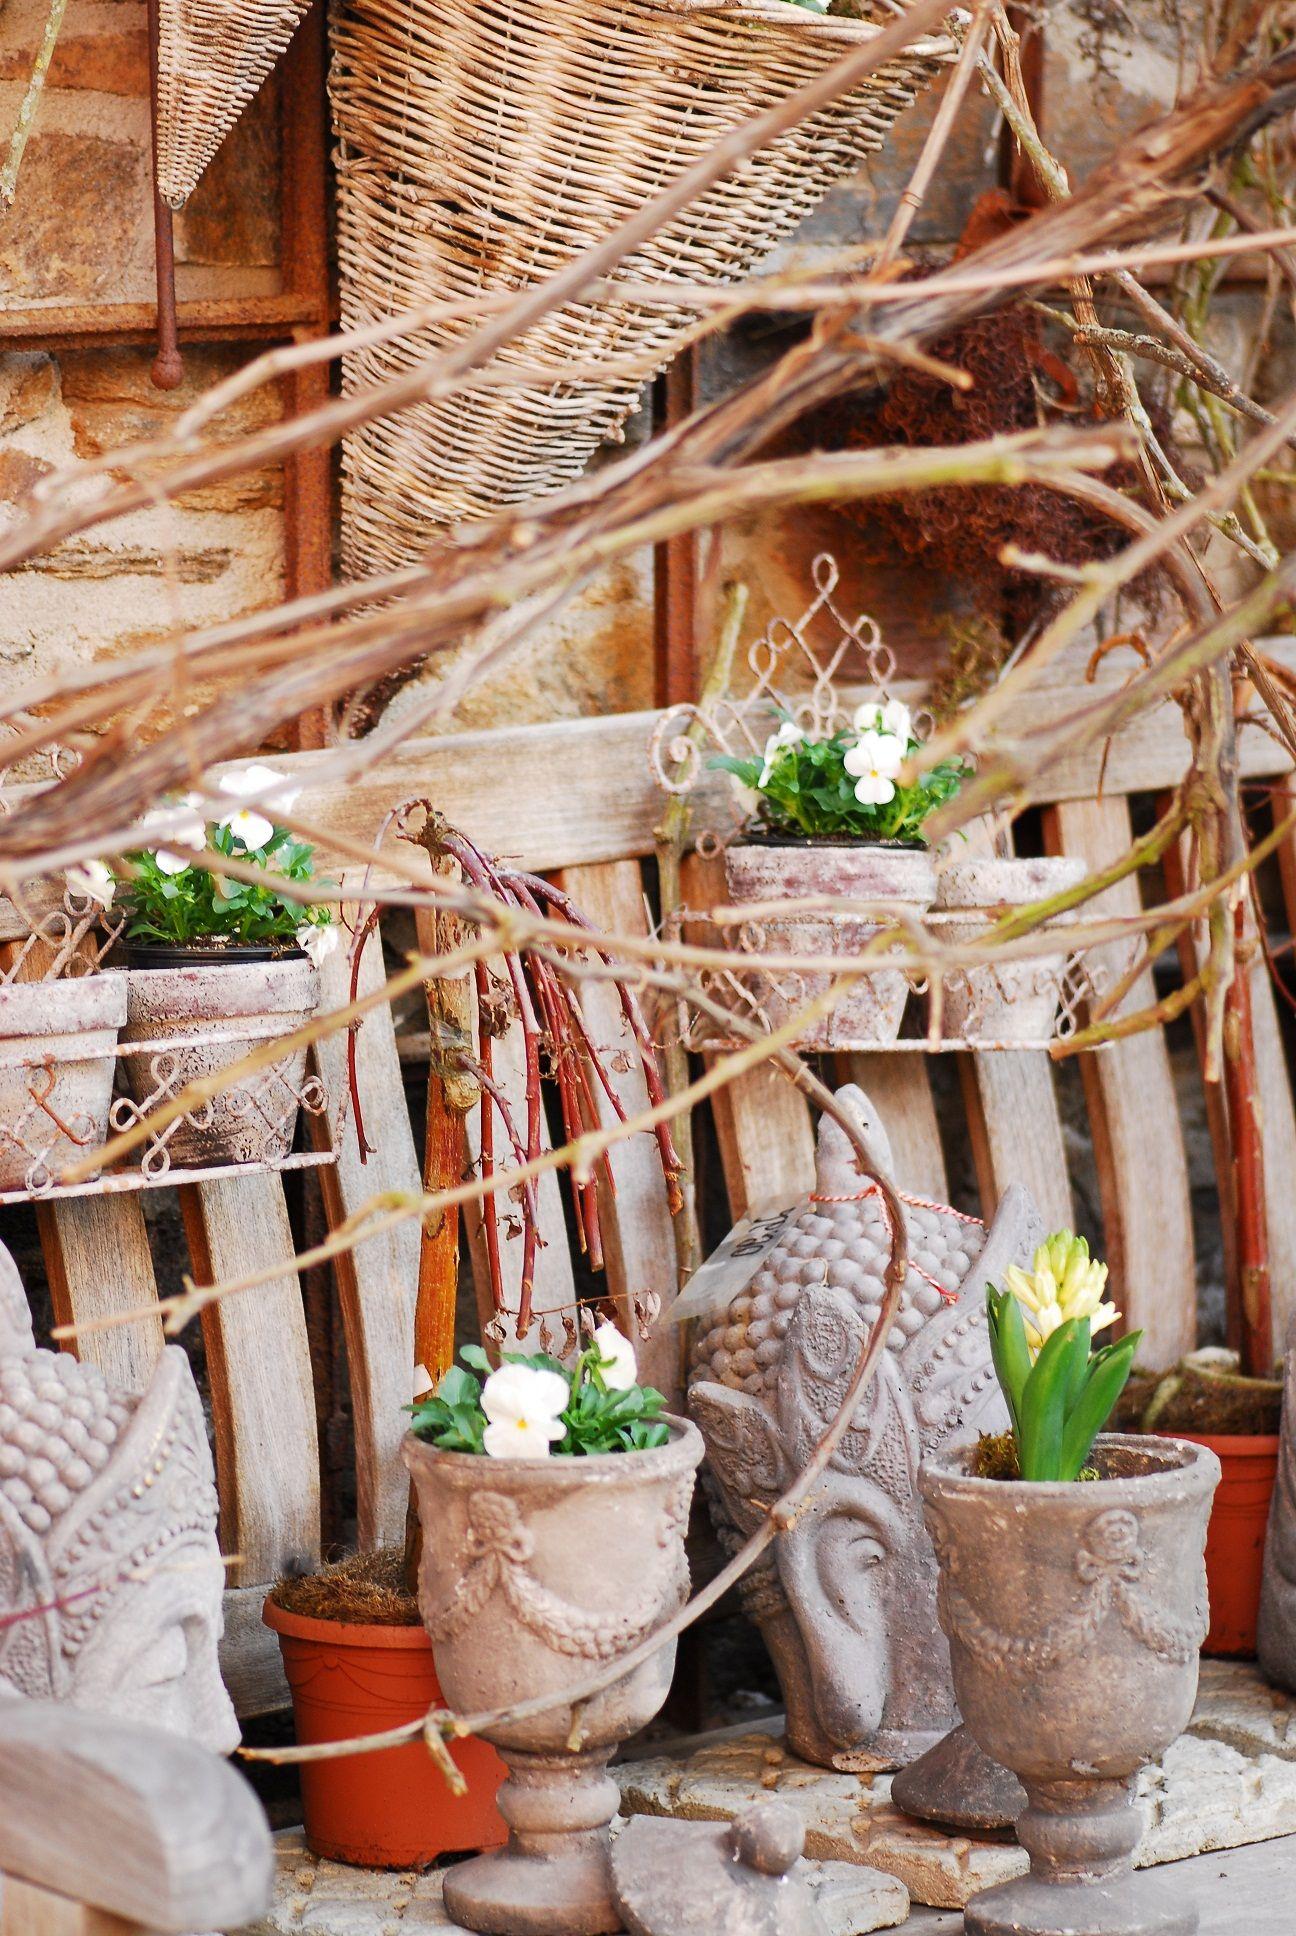 Fr hling garten pflanzen buddha vintage shabby for Dekoration pflanzen